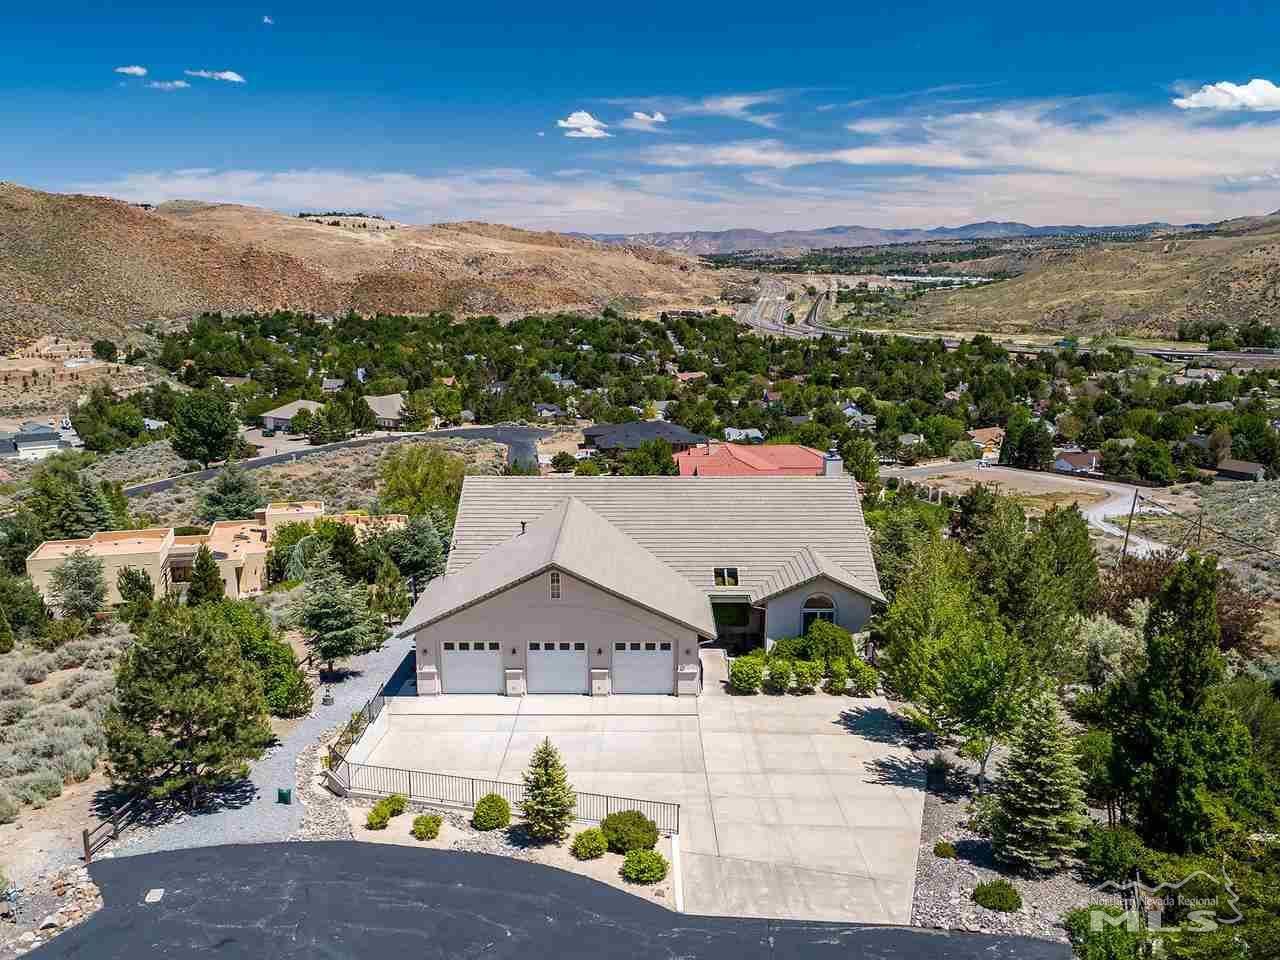 120 Mule Deer Drive, Reno, NV 89523 - #: 200007194